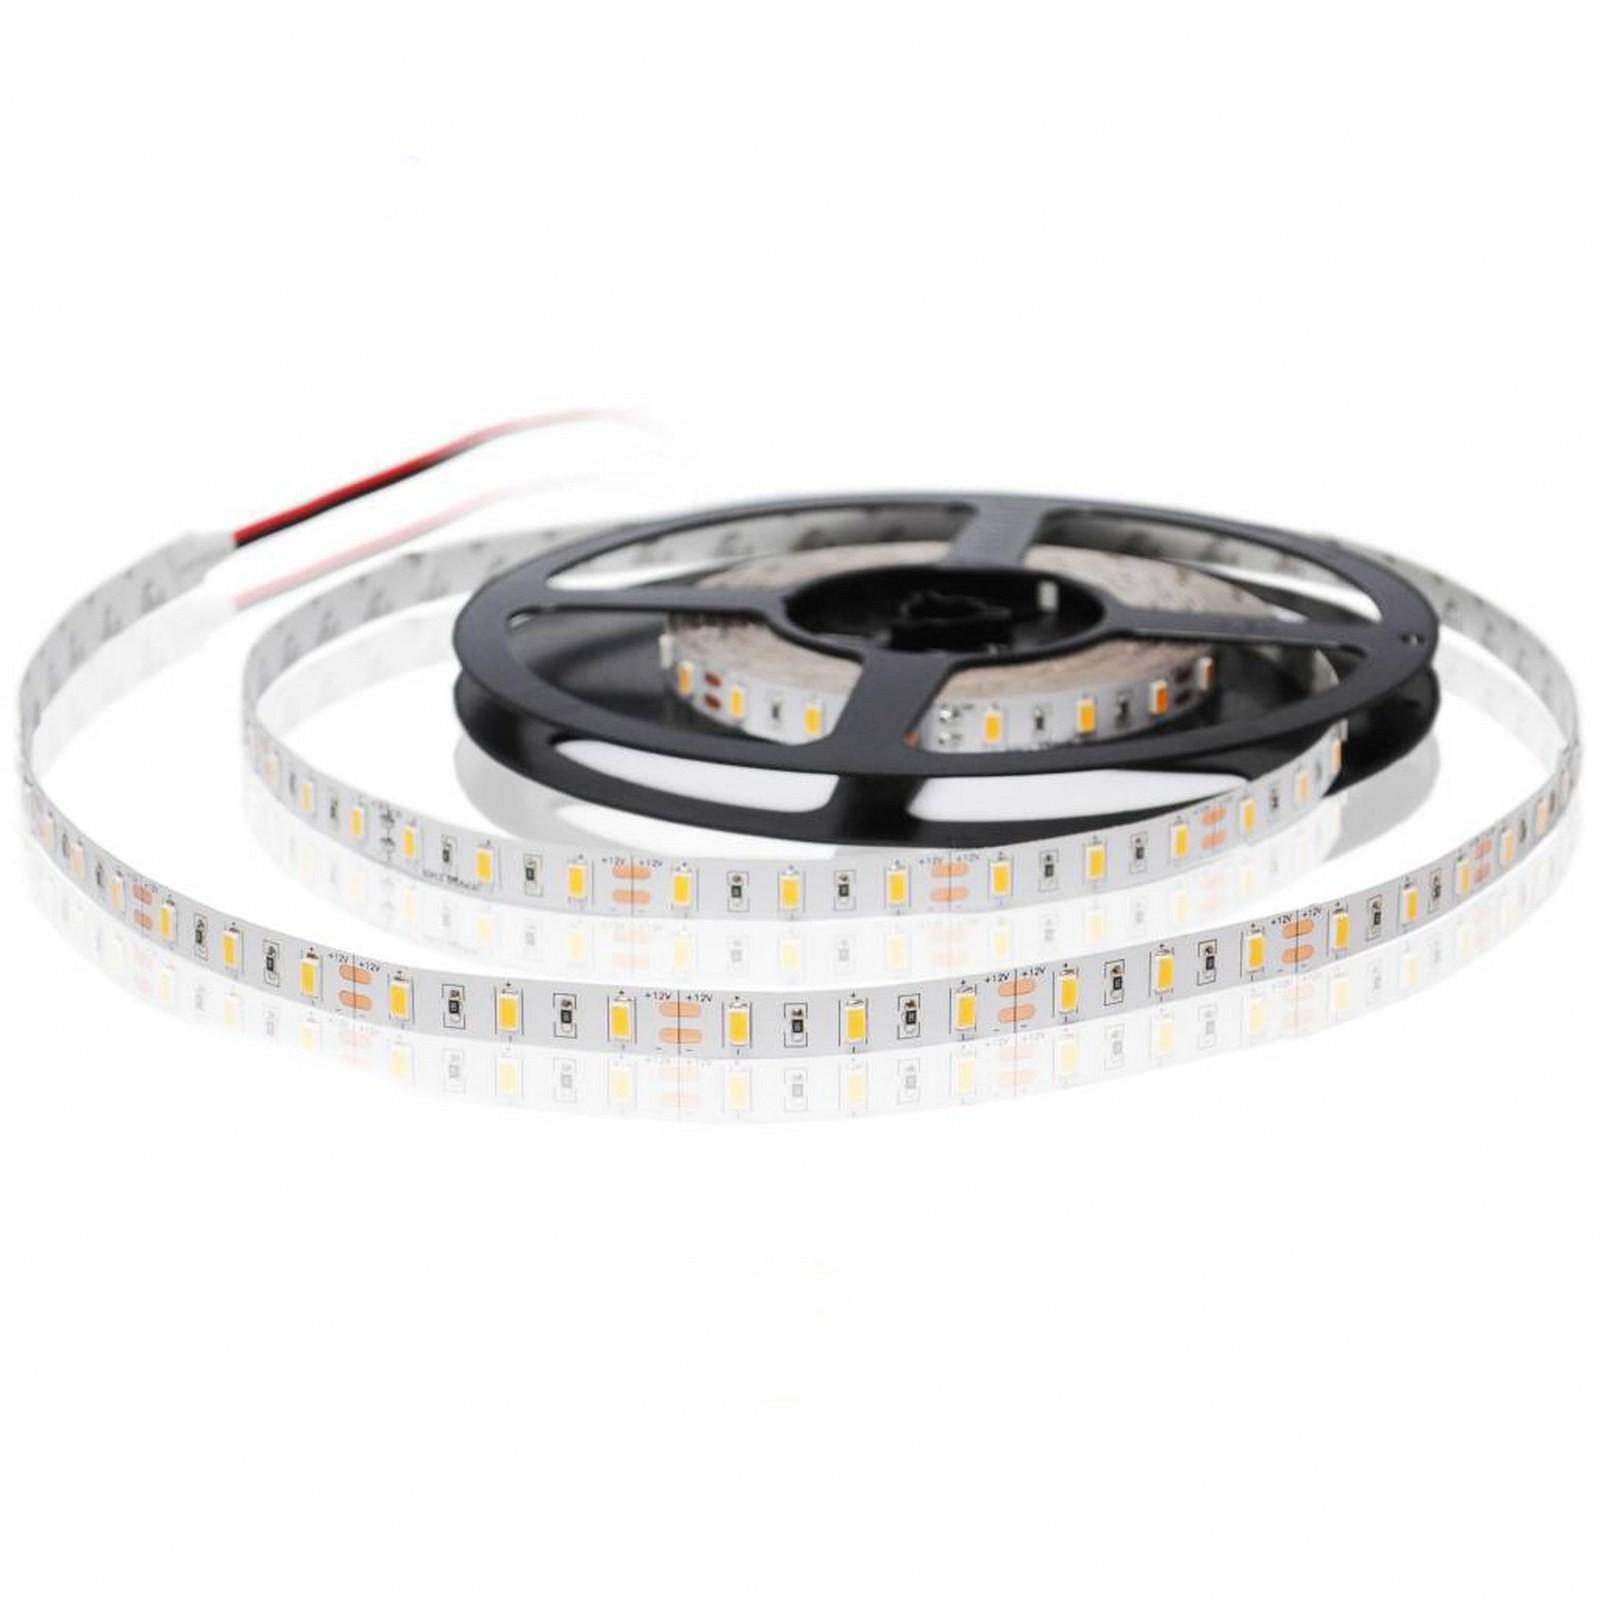 Striscia 300 LED SMD 5630 5 Mt Bobina V-TAC Luce Bianca Fredda Alta luminosità